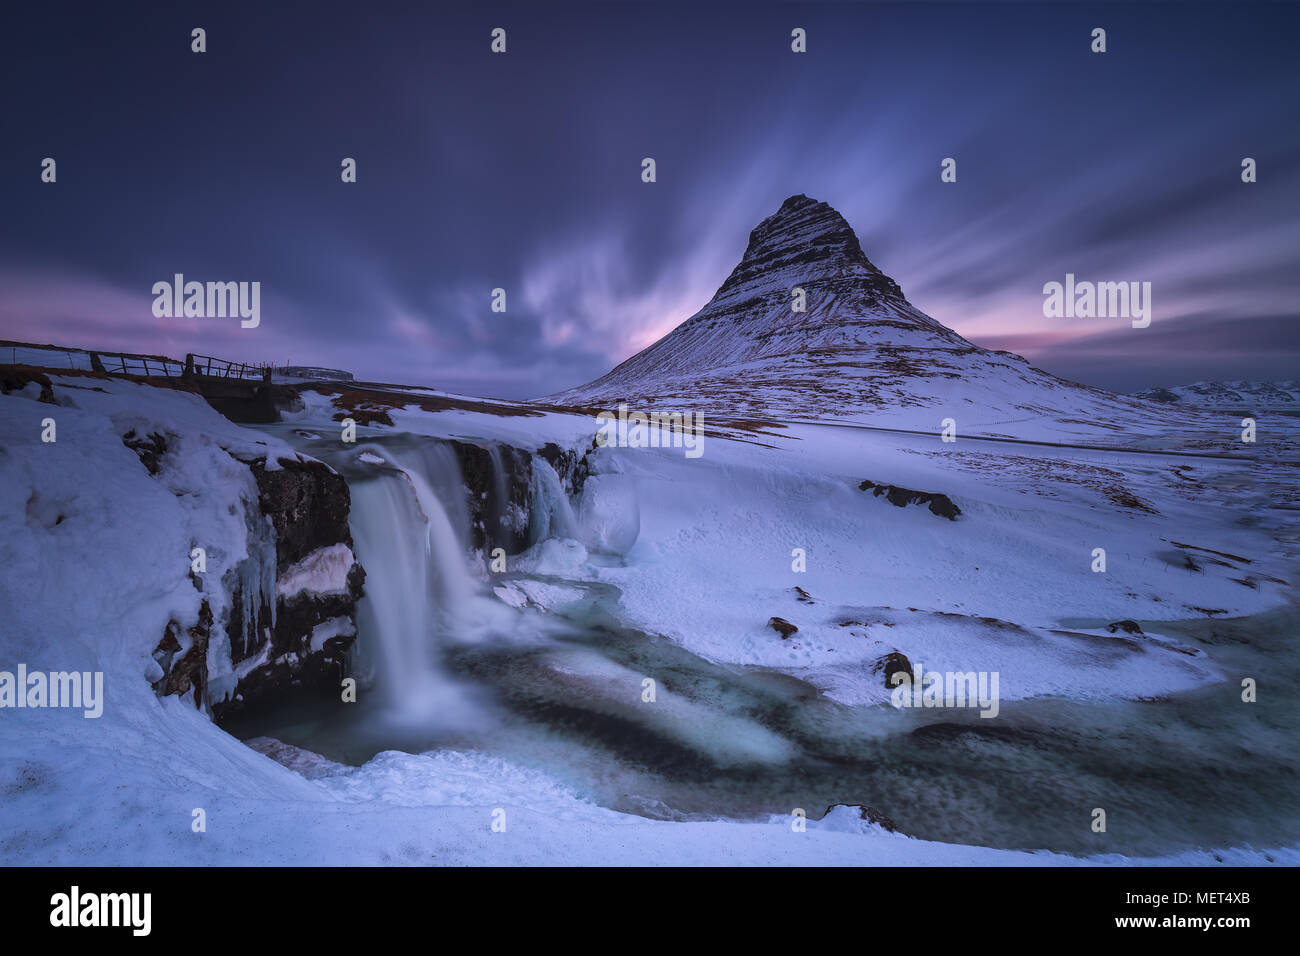 Kirkjufell and Kirkjufellfoss snowed in a cold winter - Stock Image